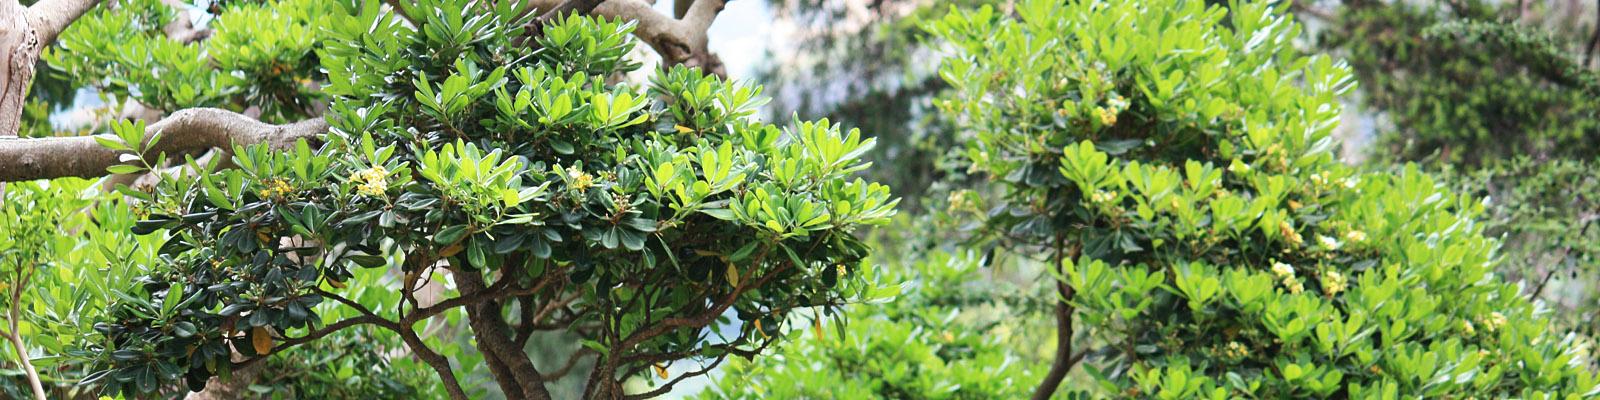 Green Parrot Gardens | Topiary, Cloud Pruning and Garden Bonsais